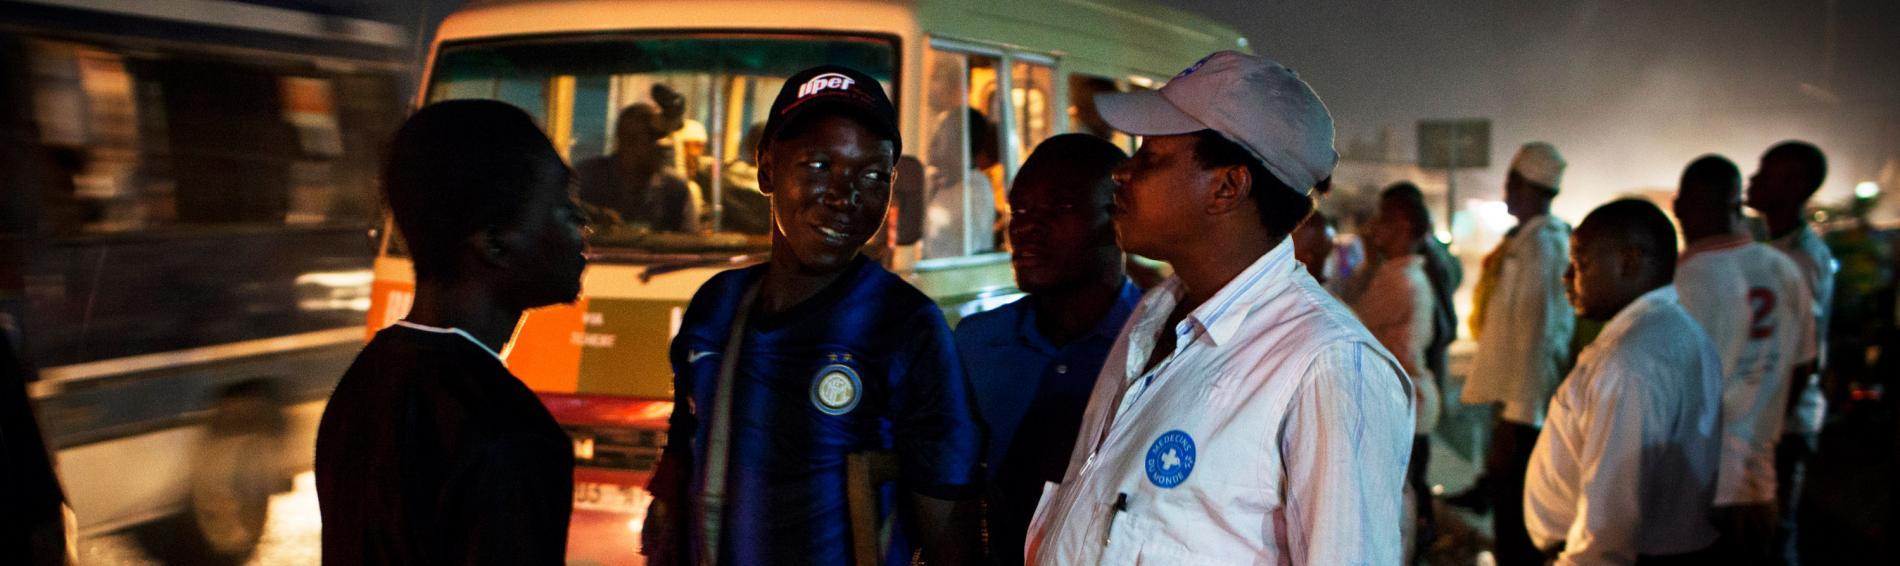 Ärzte der Welt hilft Risikogruppen in Tansania. Foto: William Daniels